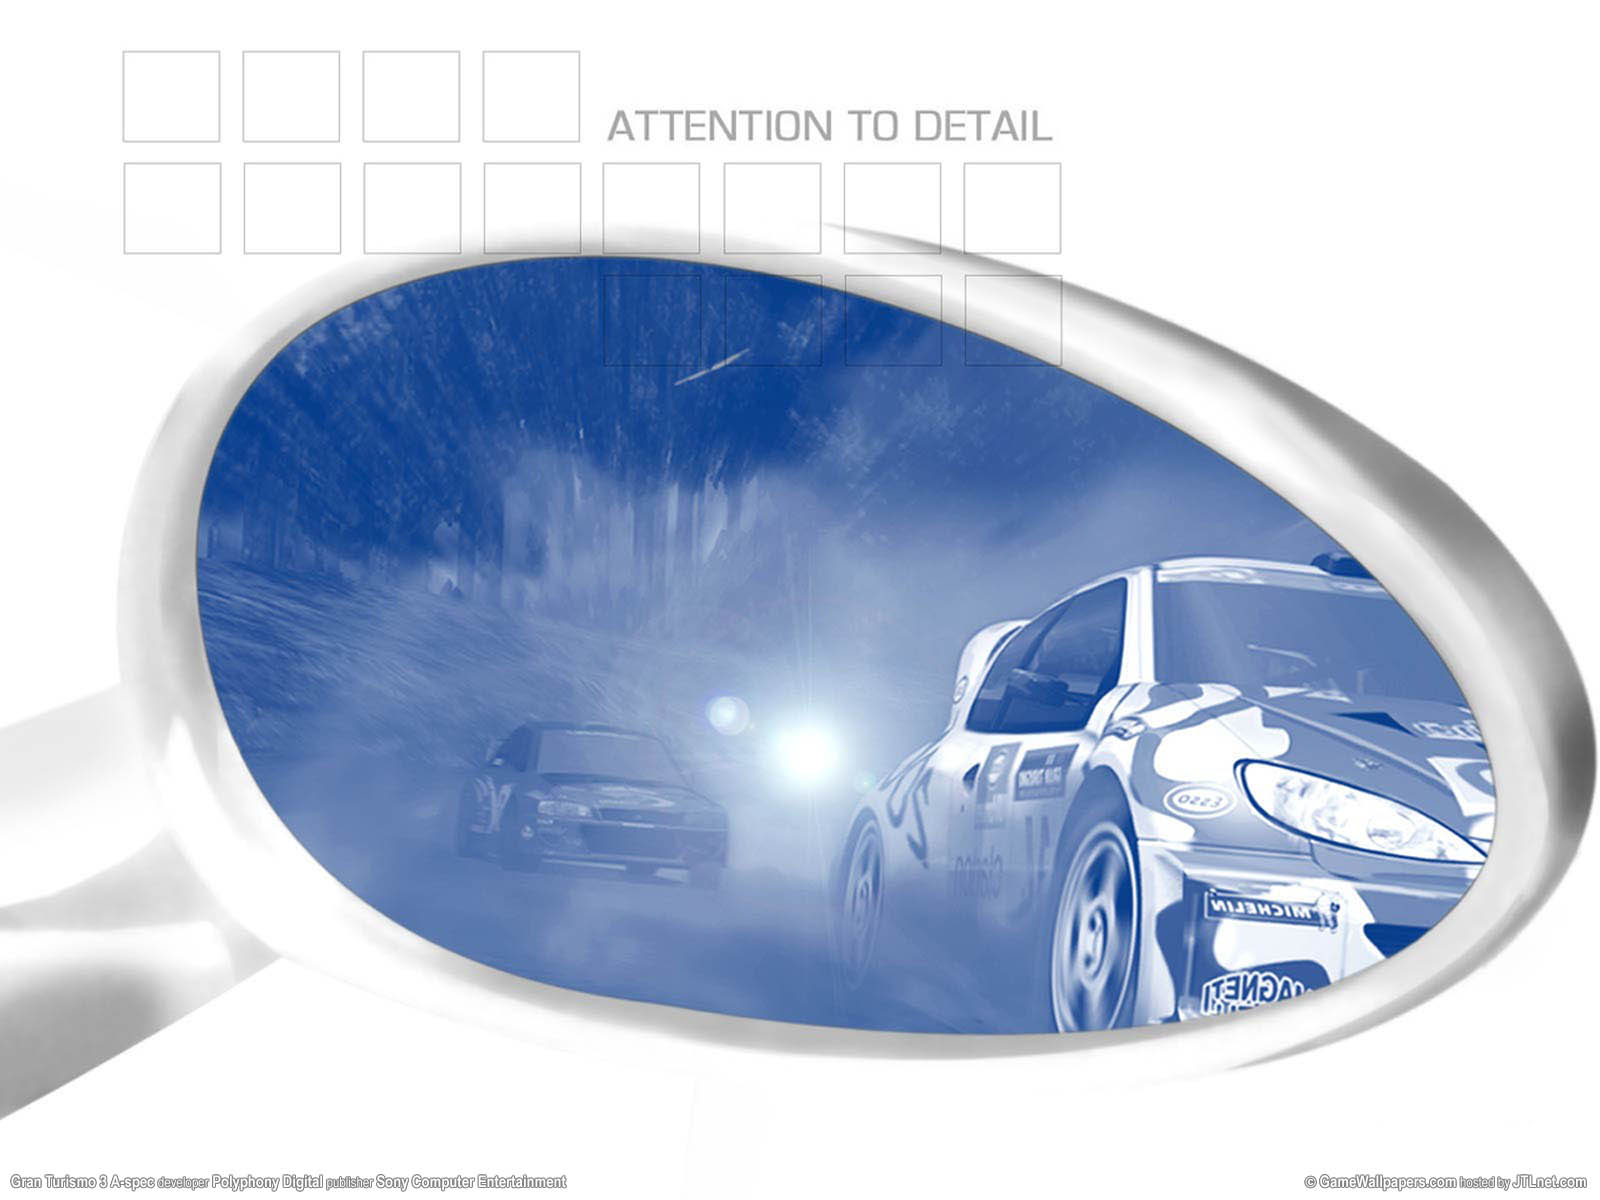 Gran Turismo 3 A-spec Hintergrundbild 04 1600x1200